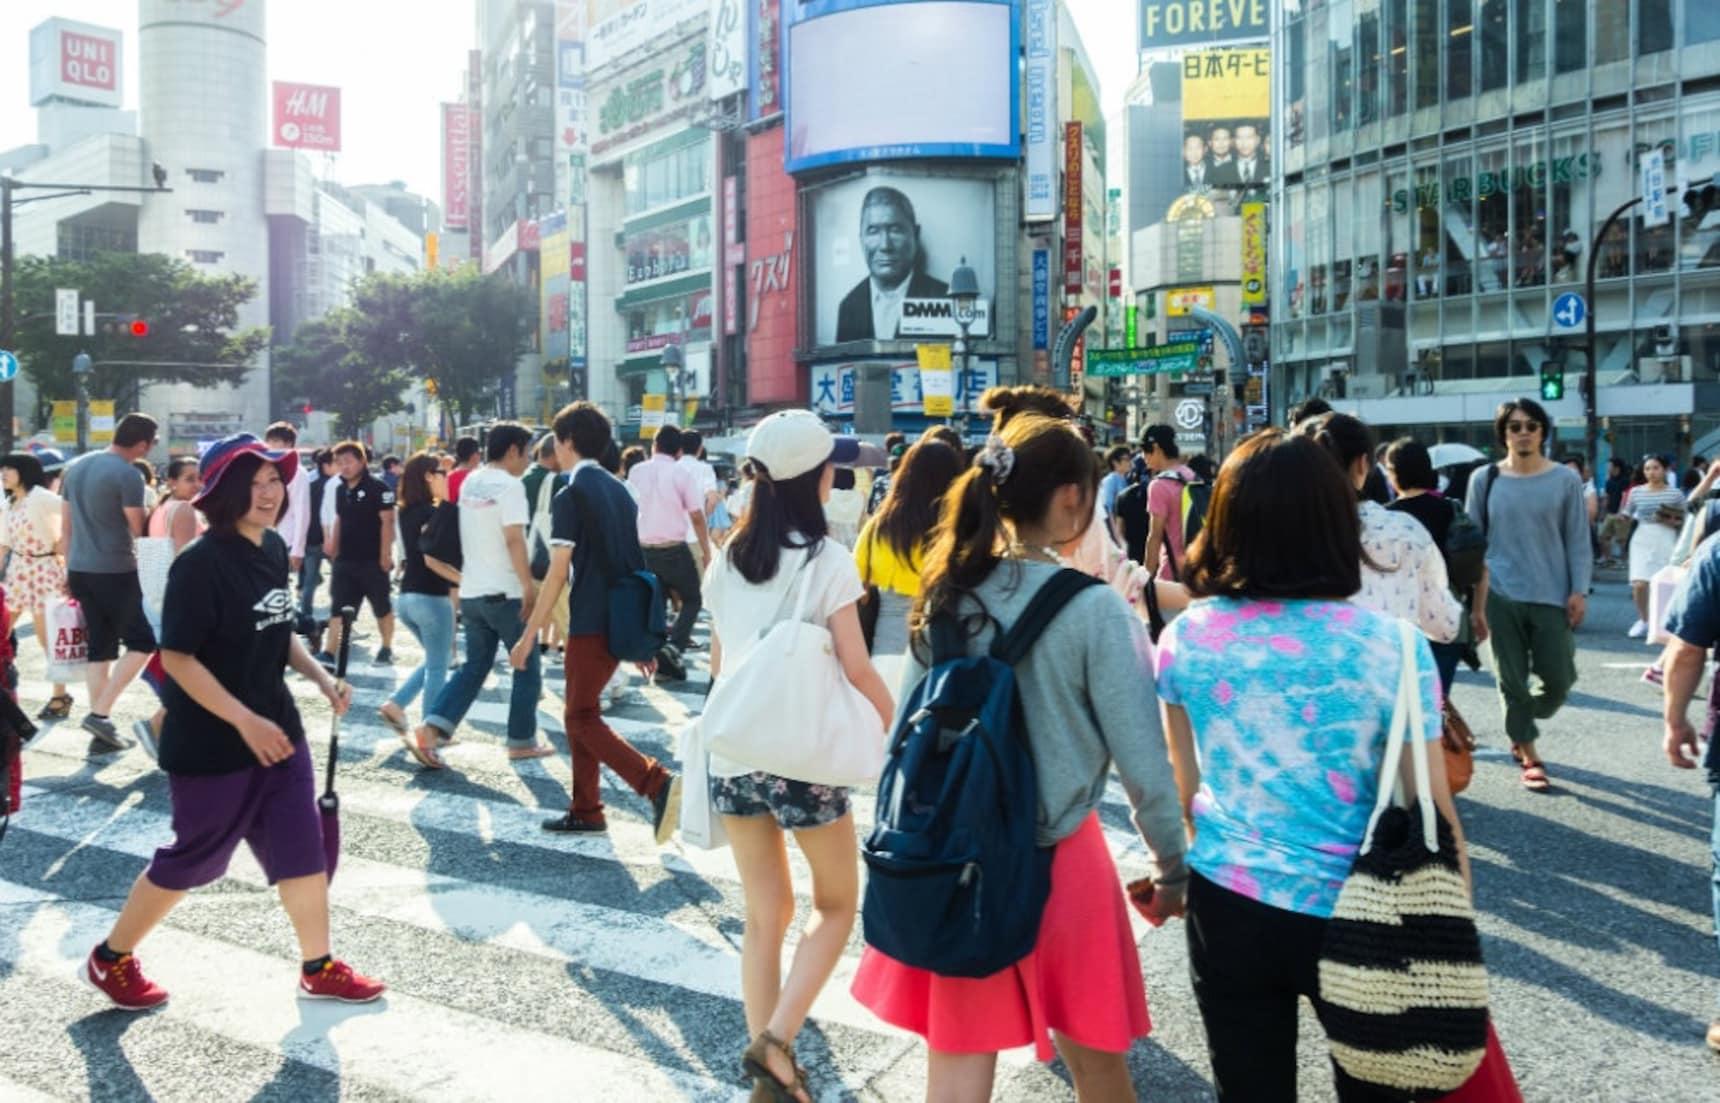 Dance in the Center of Shibuya